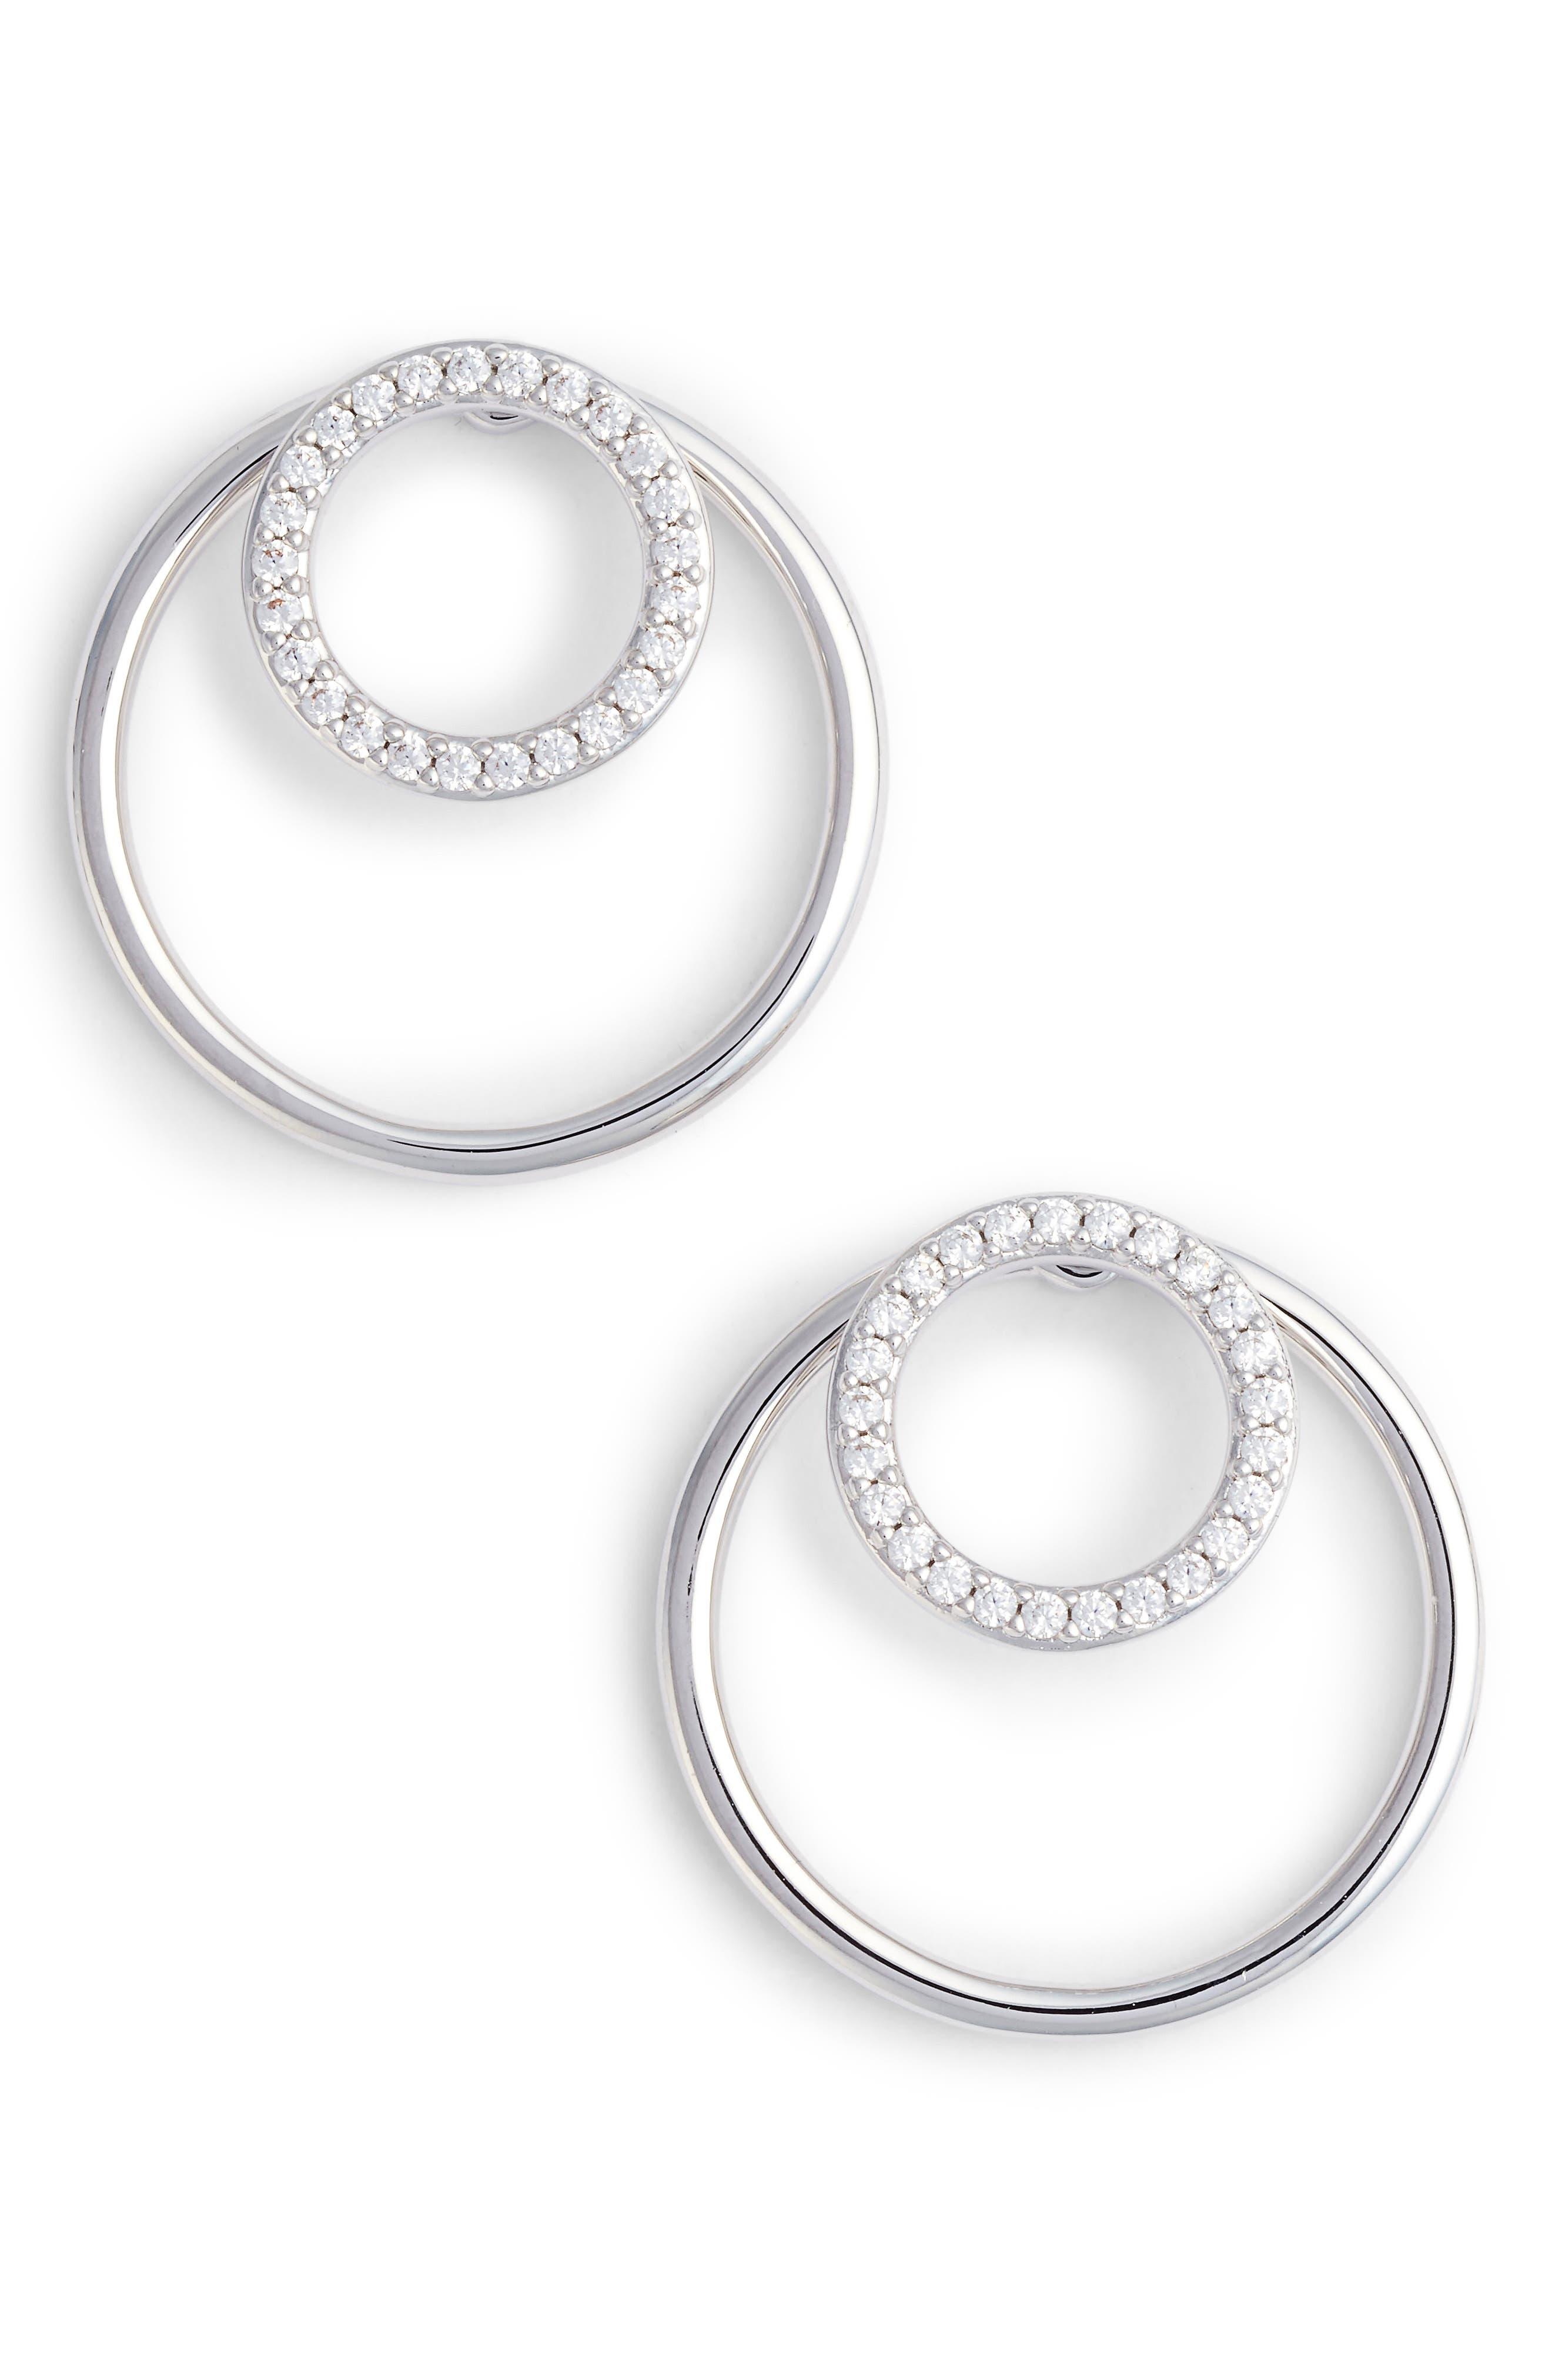 Pavé Double Circle Earrings,                             Main thumbnail 1, color,                             SILVER